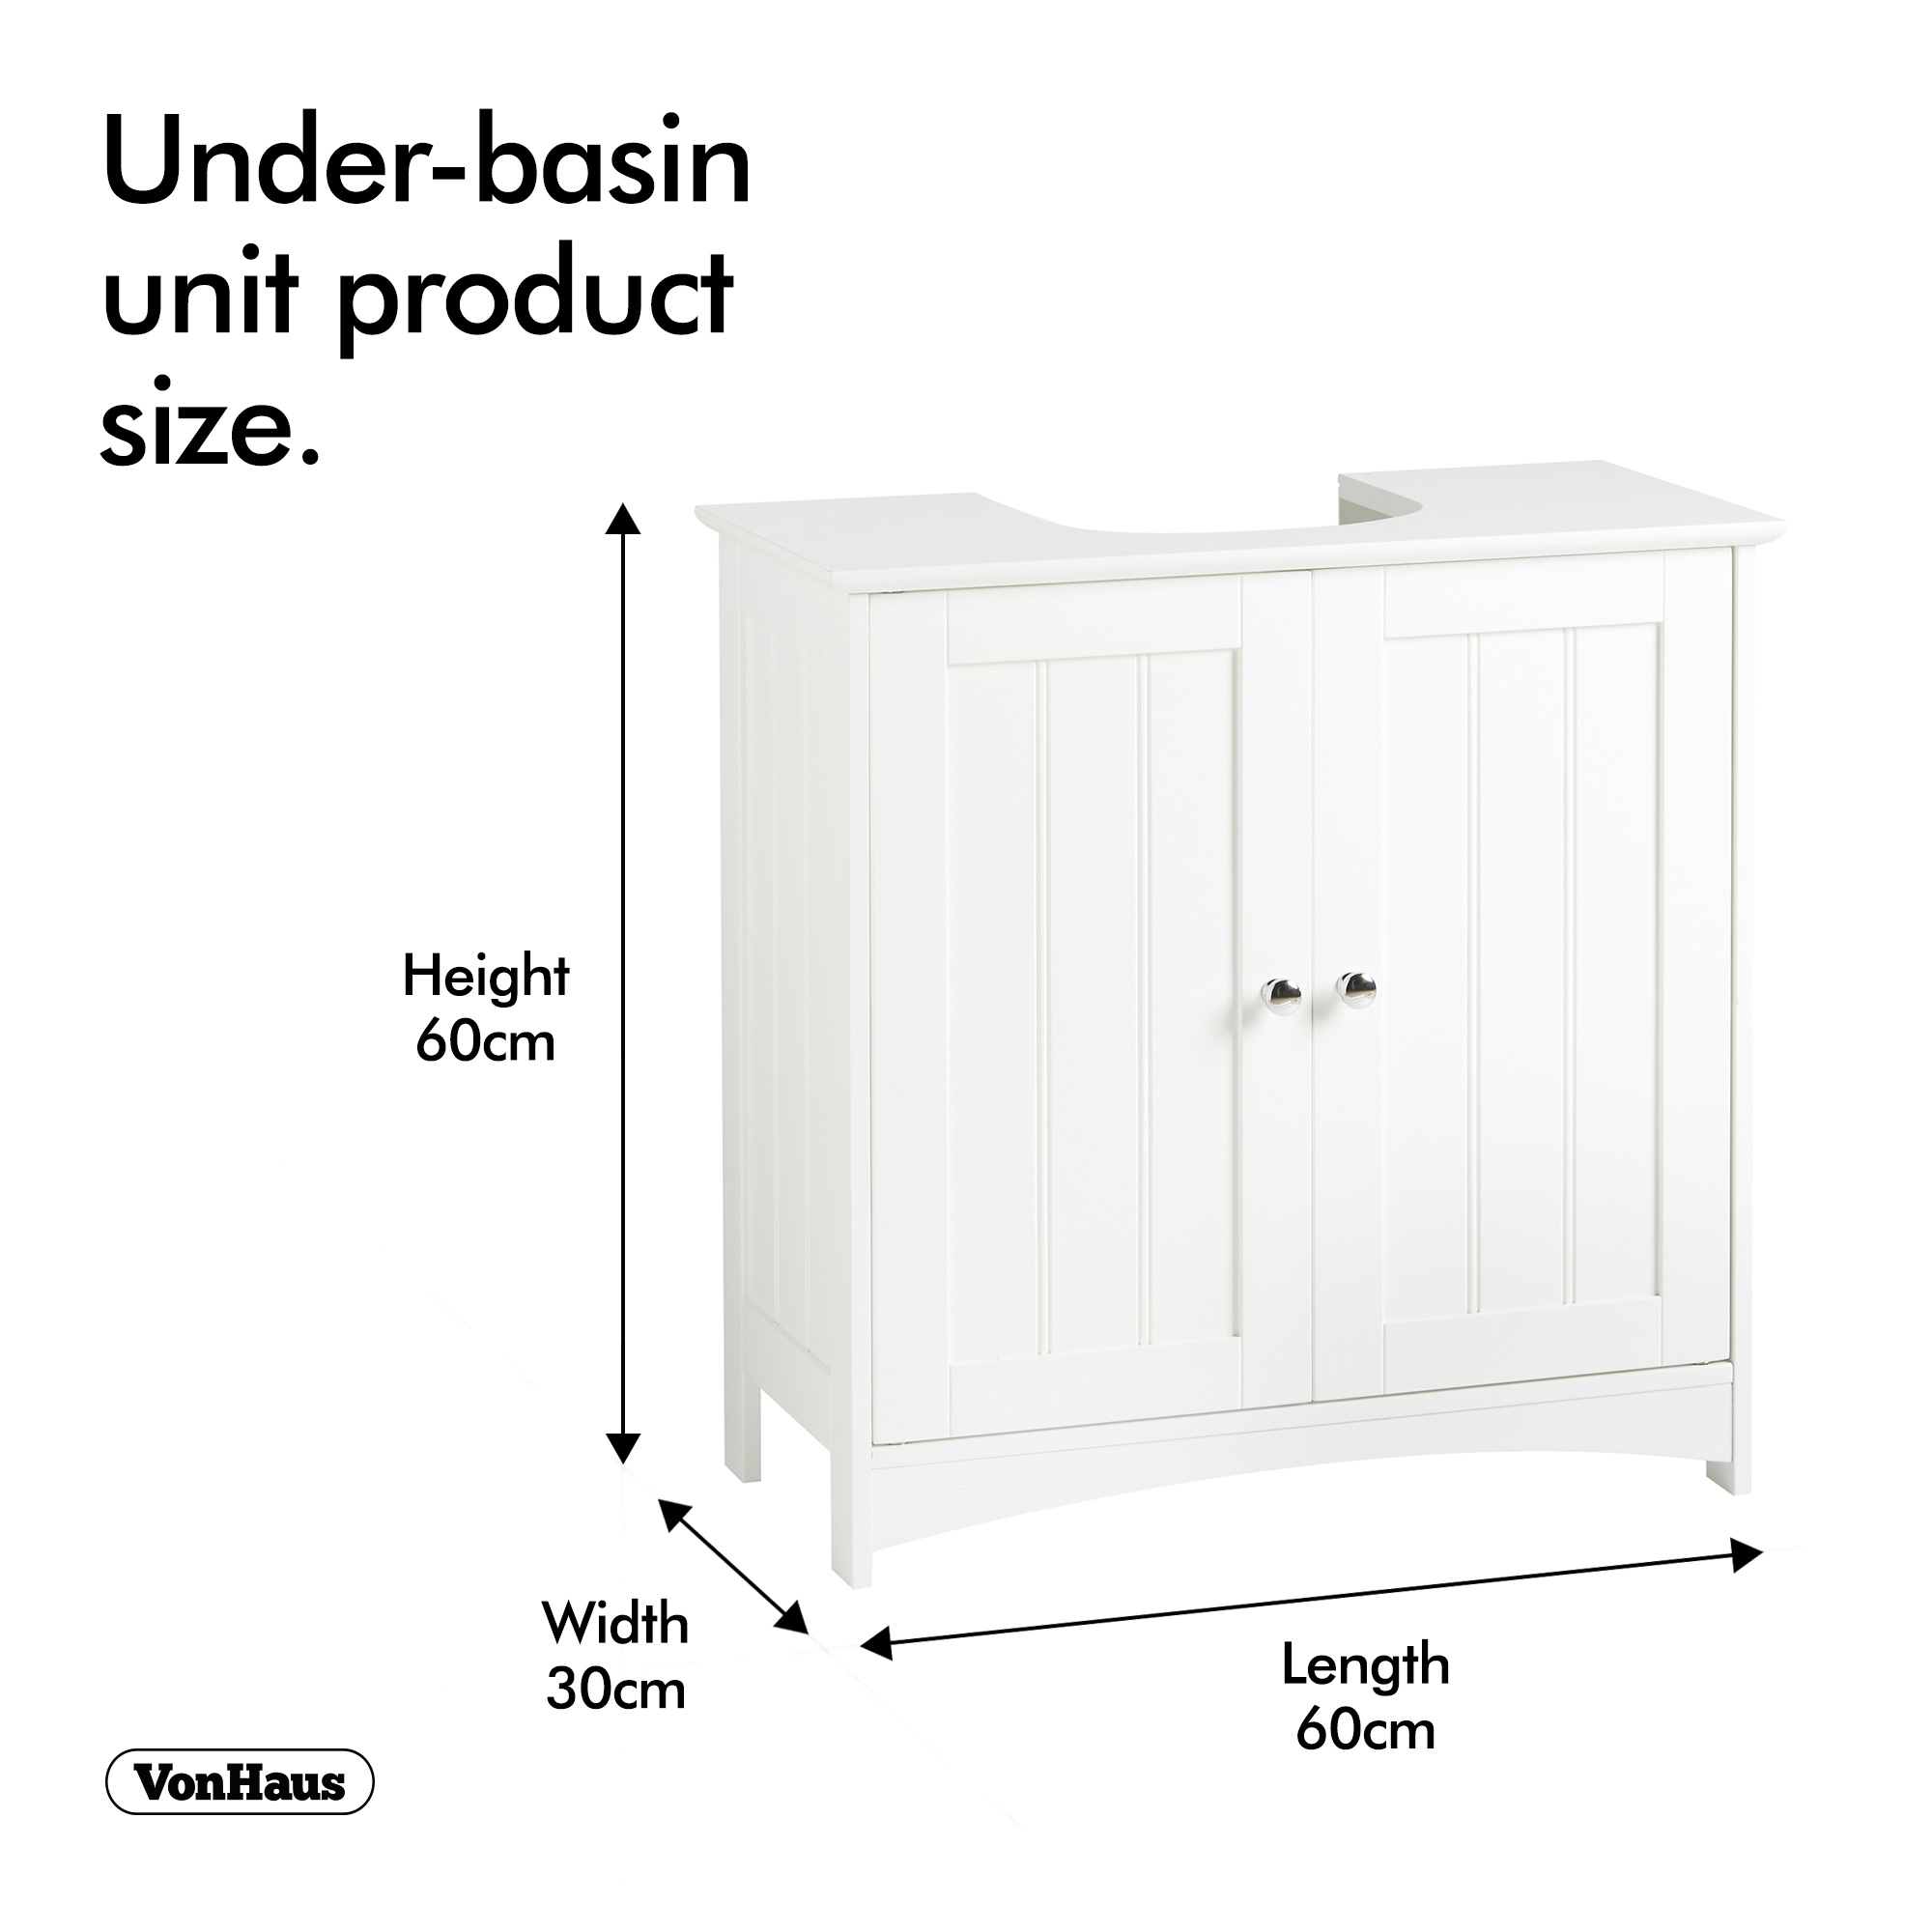 Beliani modern malaga bathroom vanity with sink cabinets and mirrors - Great Sentinel Vonhaus Colonial Style Under Basin Storage Unit With Under Basin Unit Finest Foxhunter Vanity Unit Wooden Under Sink Wash Basin Bathroom